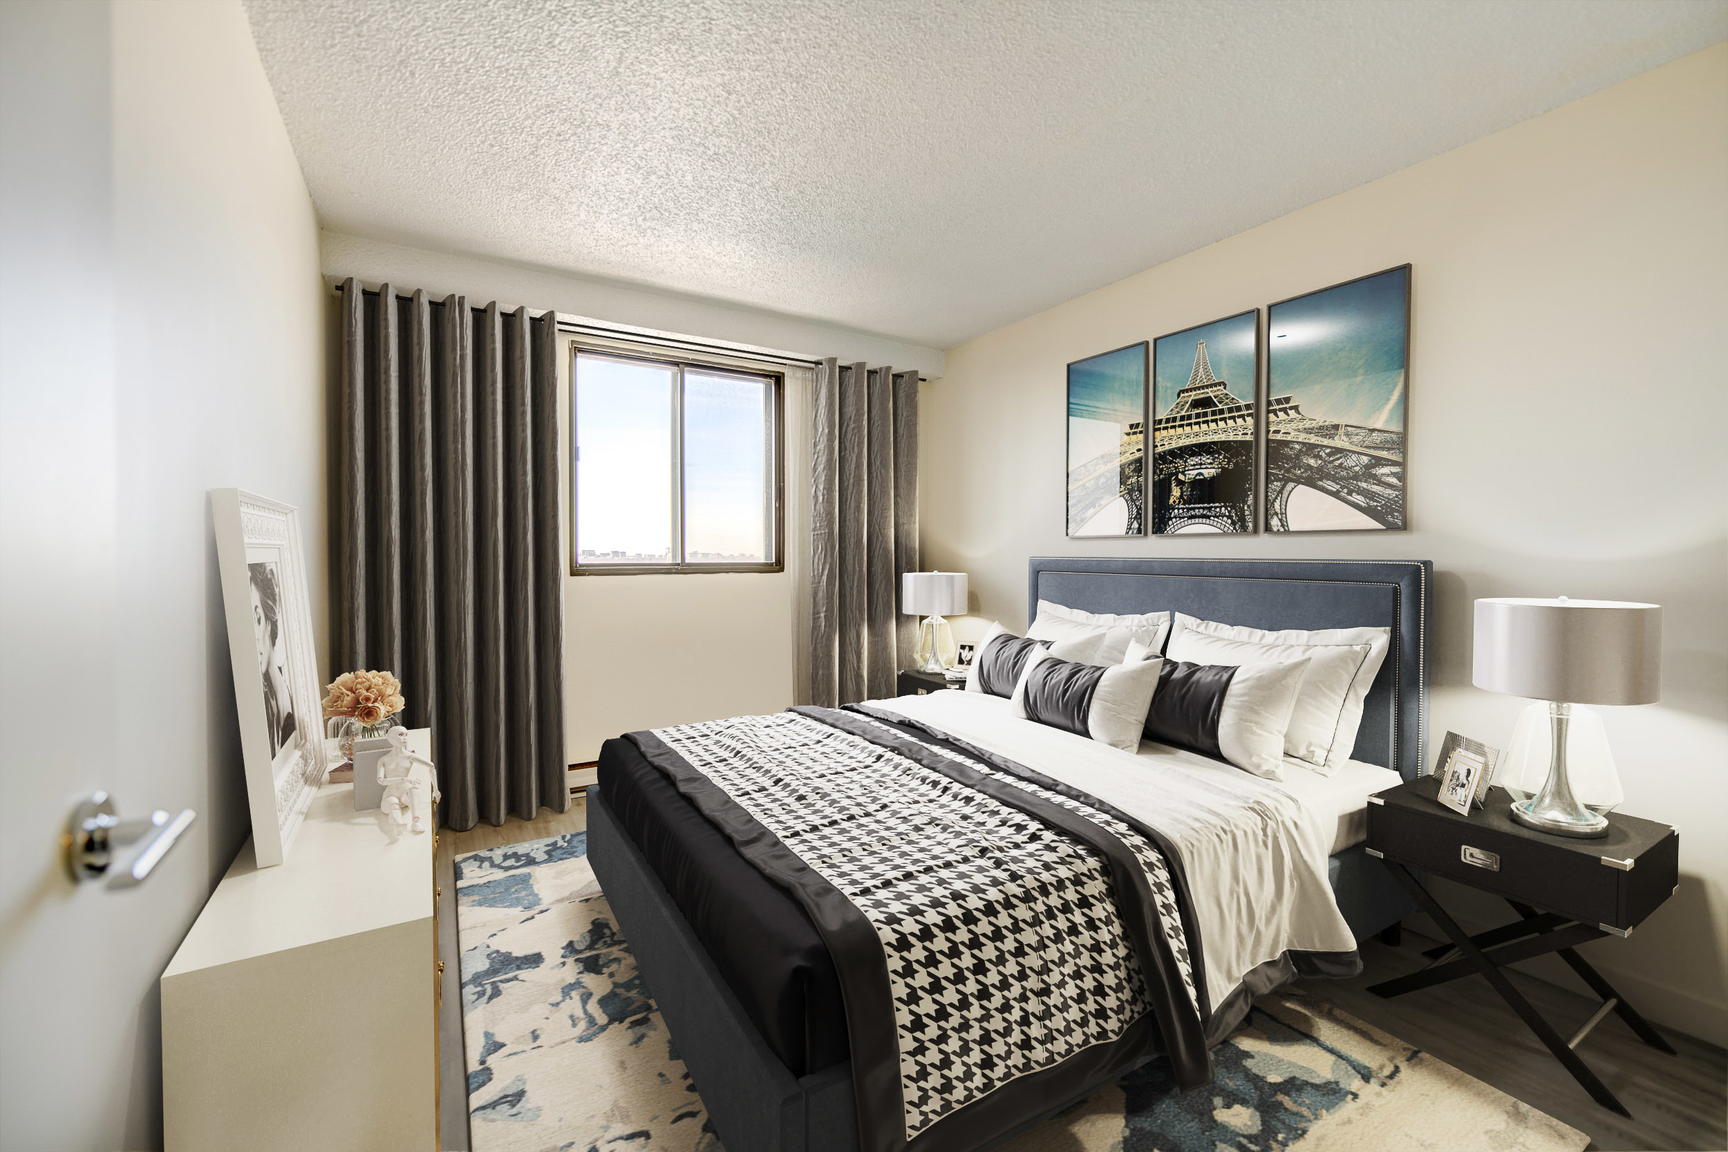 1 bedroom Apartments for rent in Laval at Le Quatre Cent - Photo 04 - RentersPages – L407184